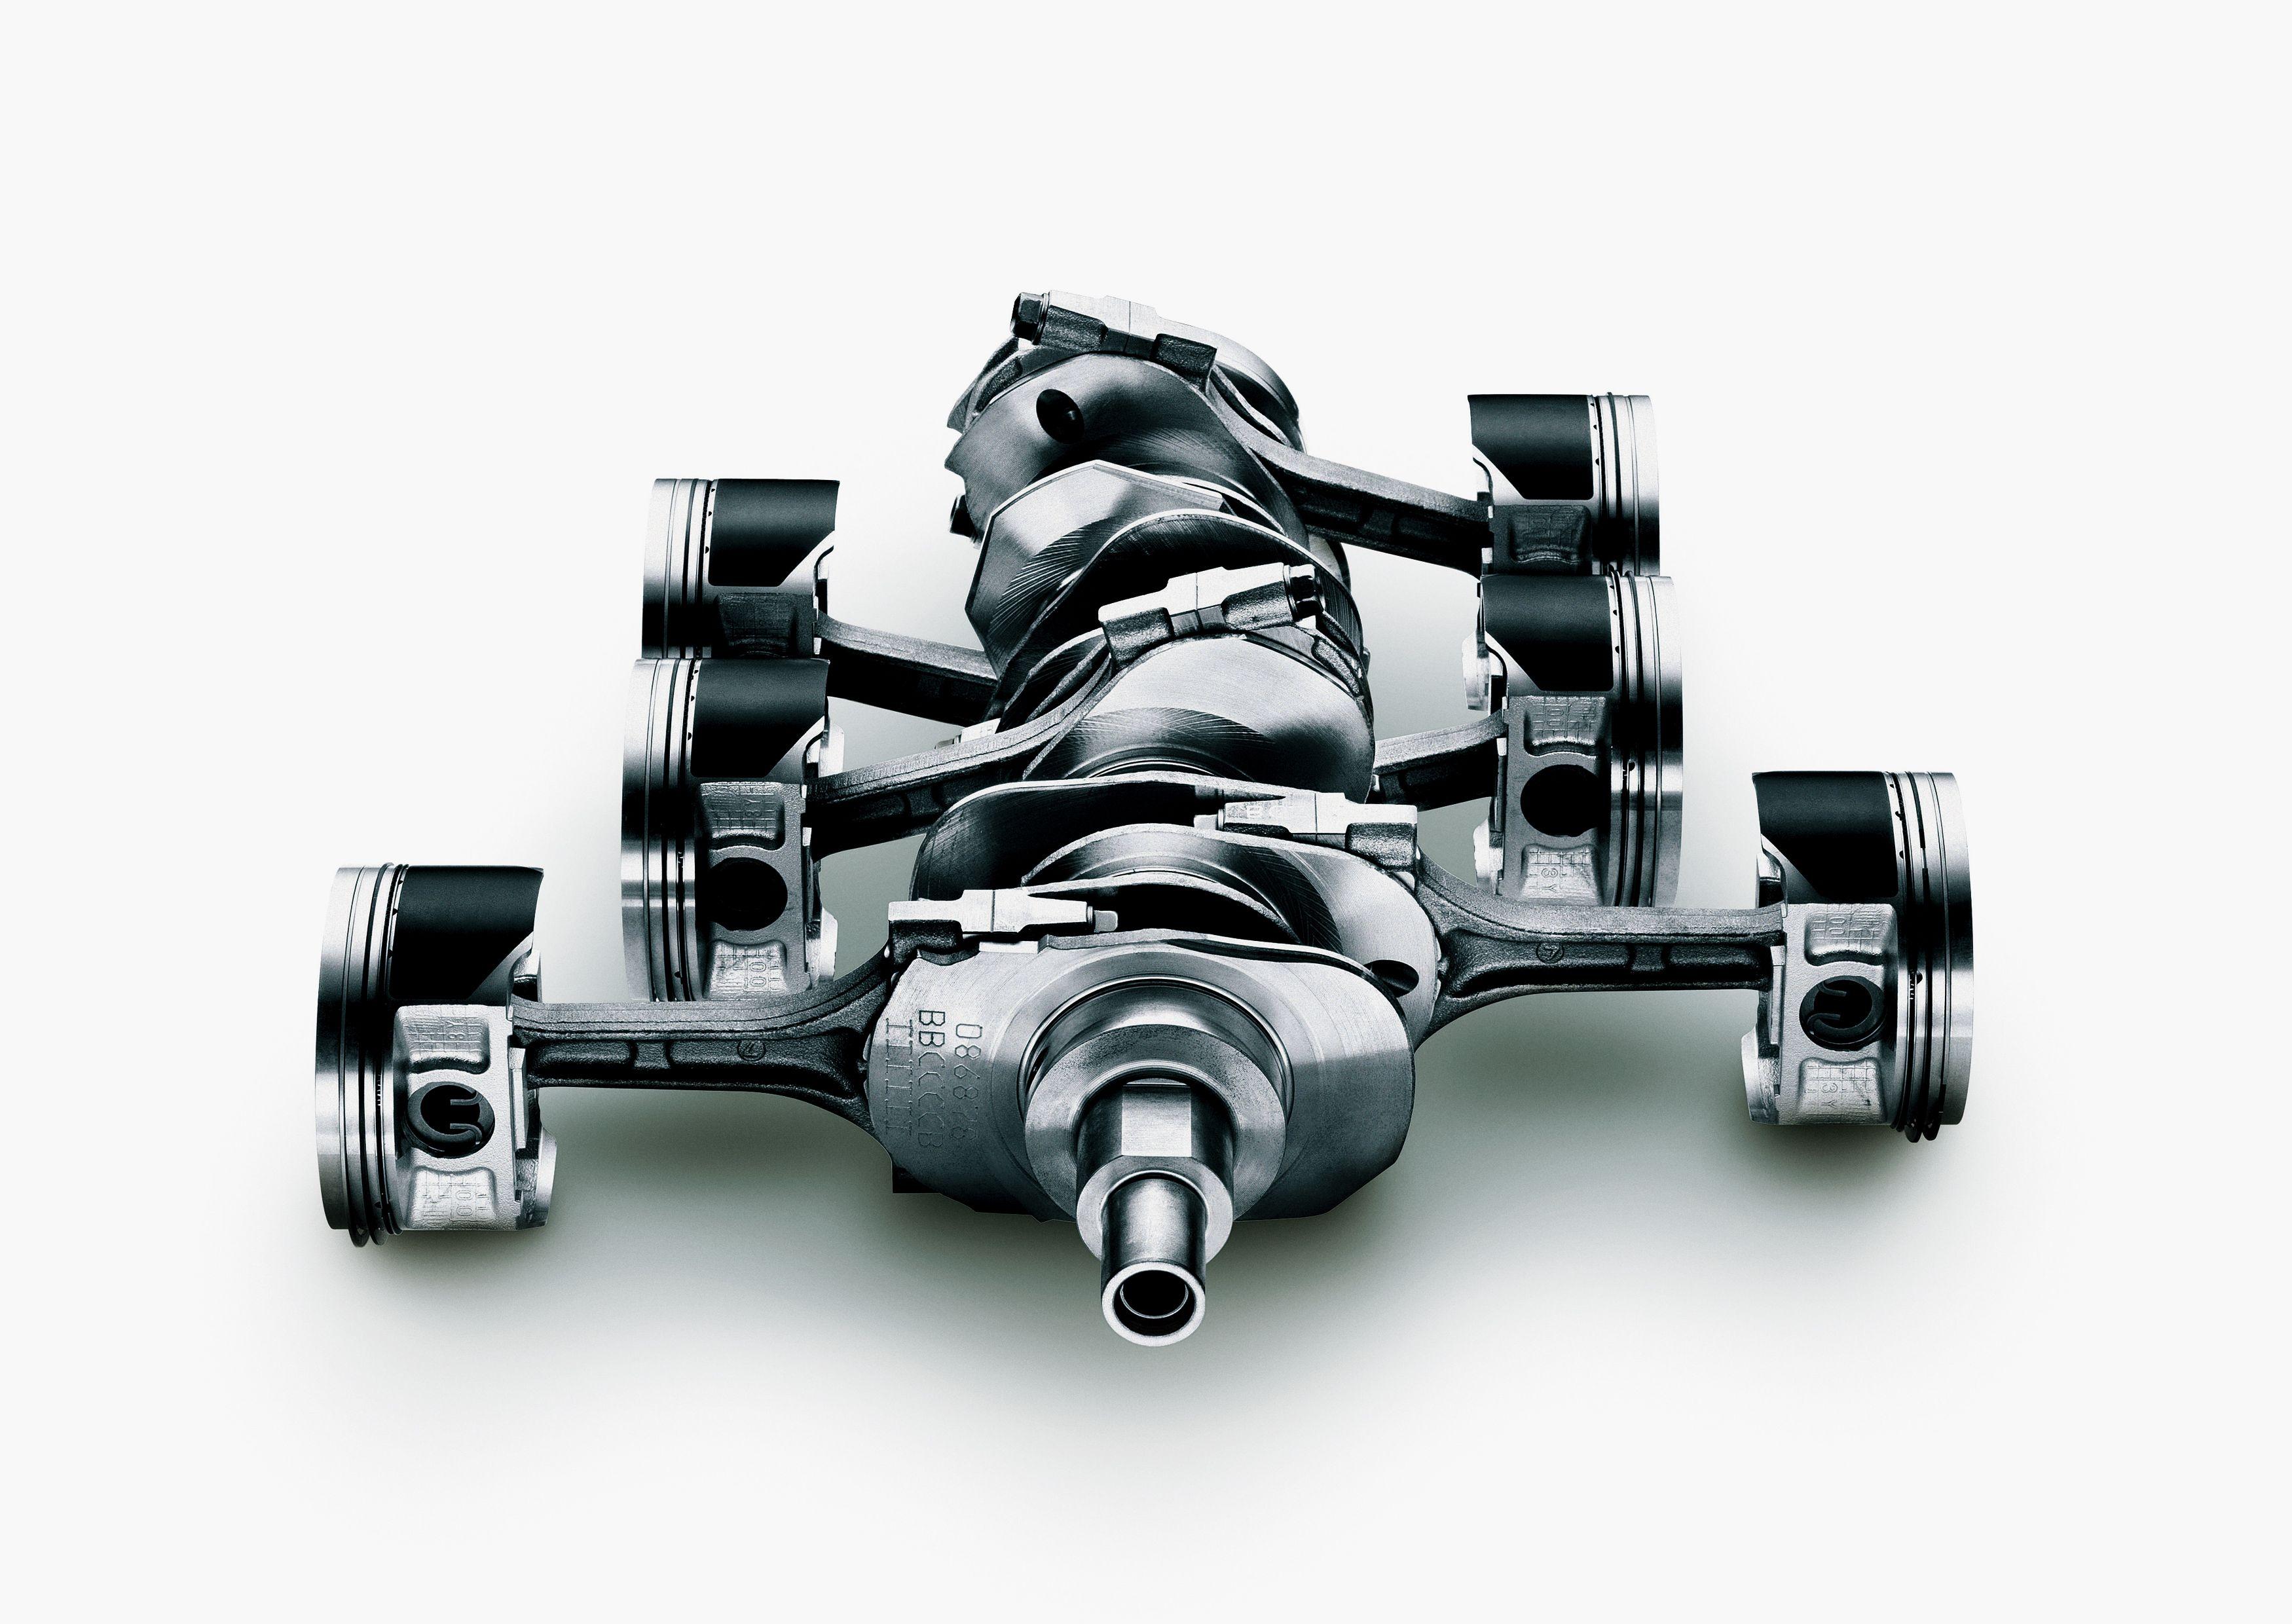 B9 Tribeca Subaru Boxer 6 Cylinder Engine Piston Cars Engines 4wd Diagram